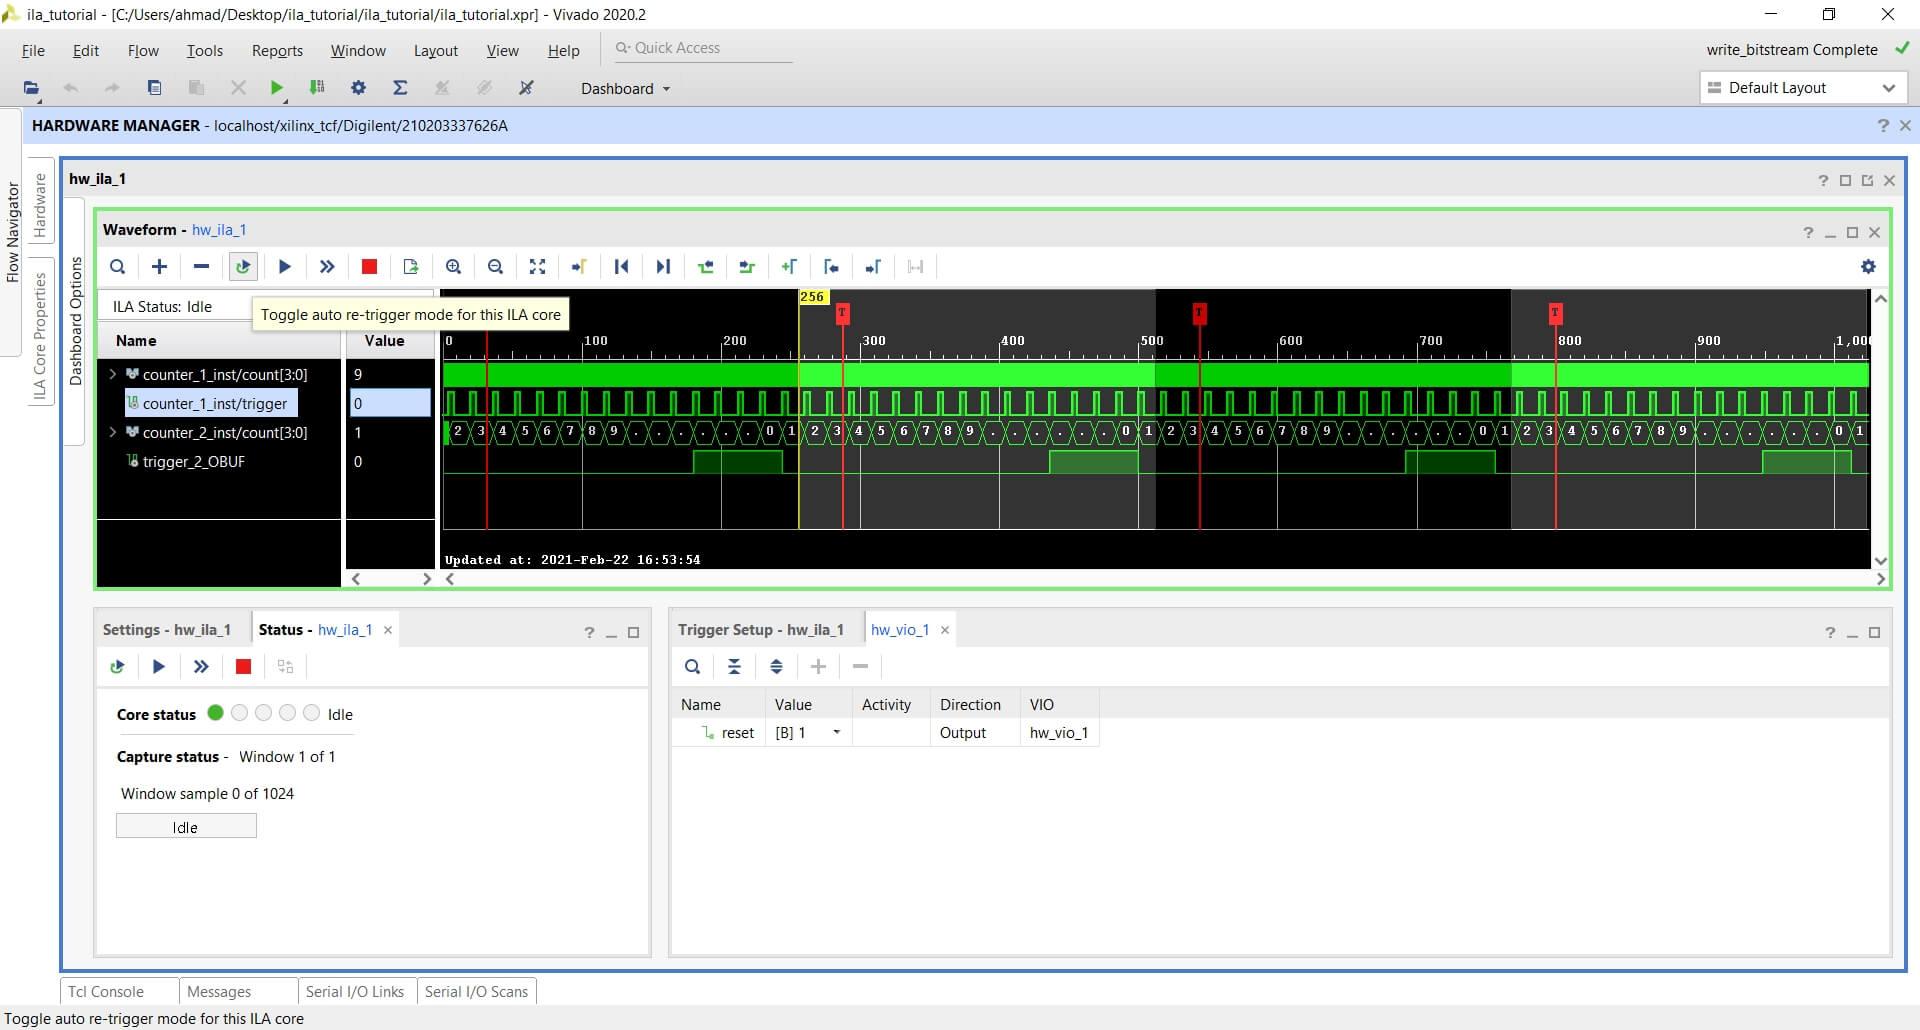 Toggle auto re-trigger mode for this ILA core